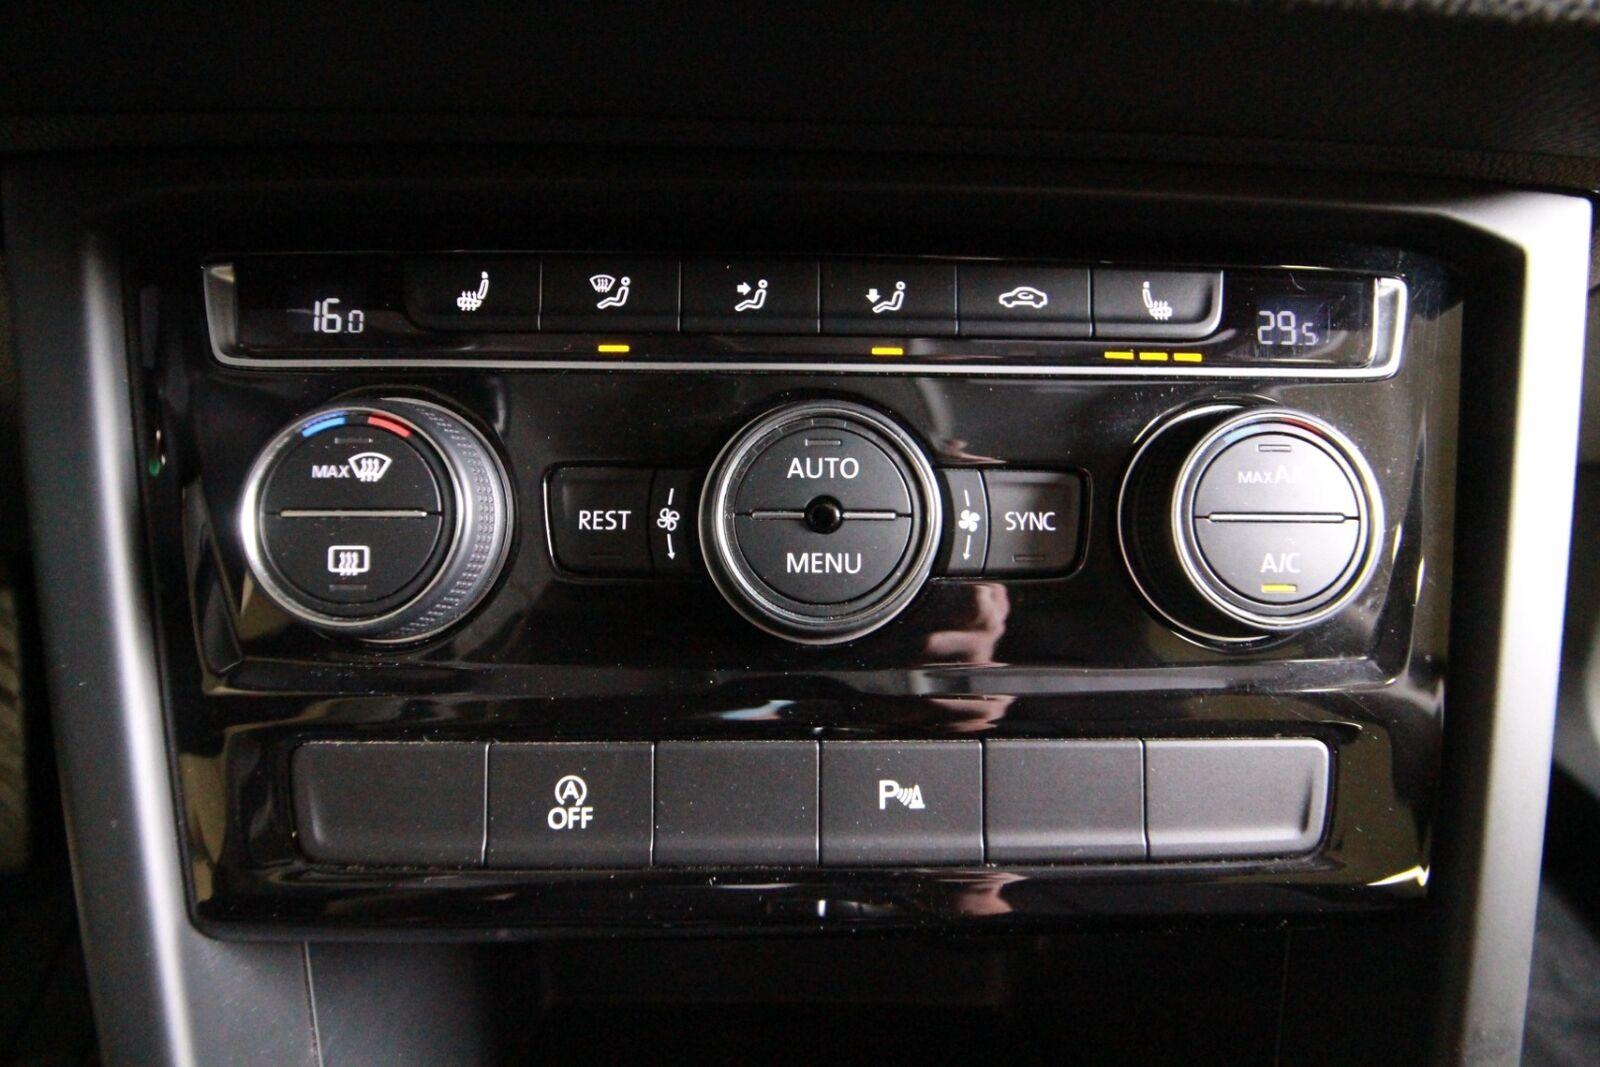 VW Touran TDi 150 Comfortline DSG 7prs